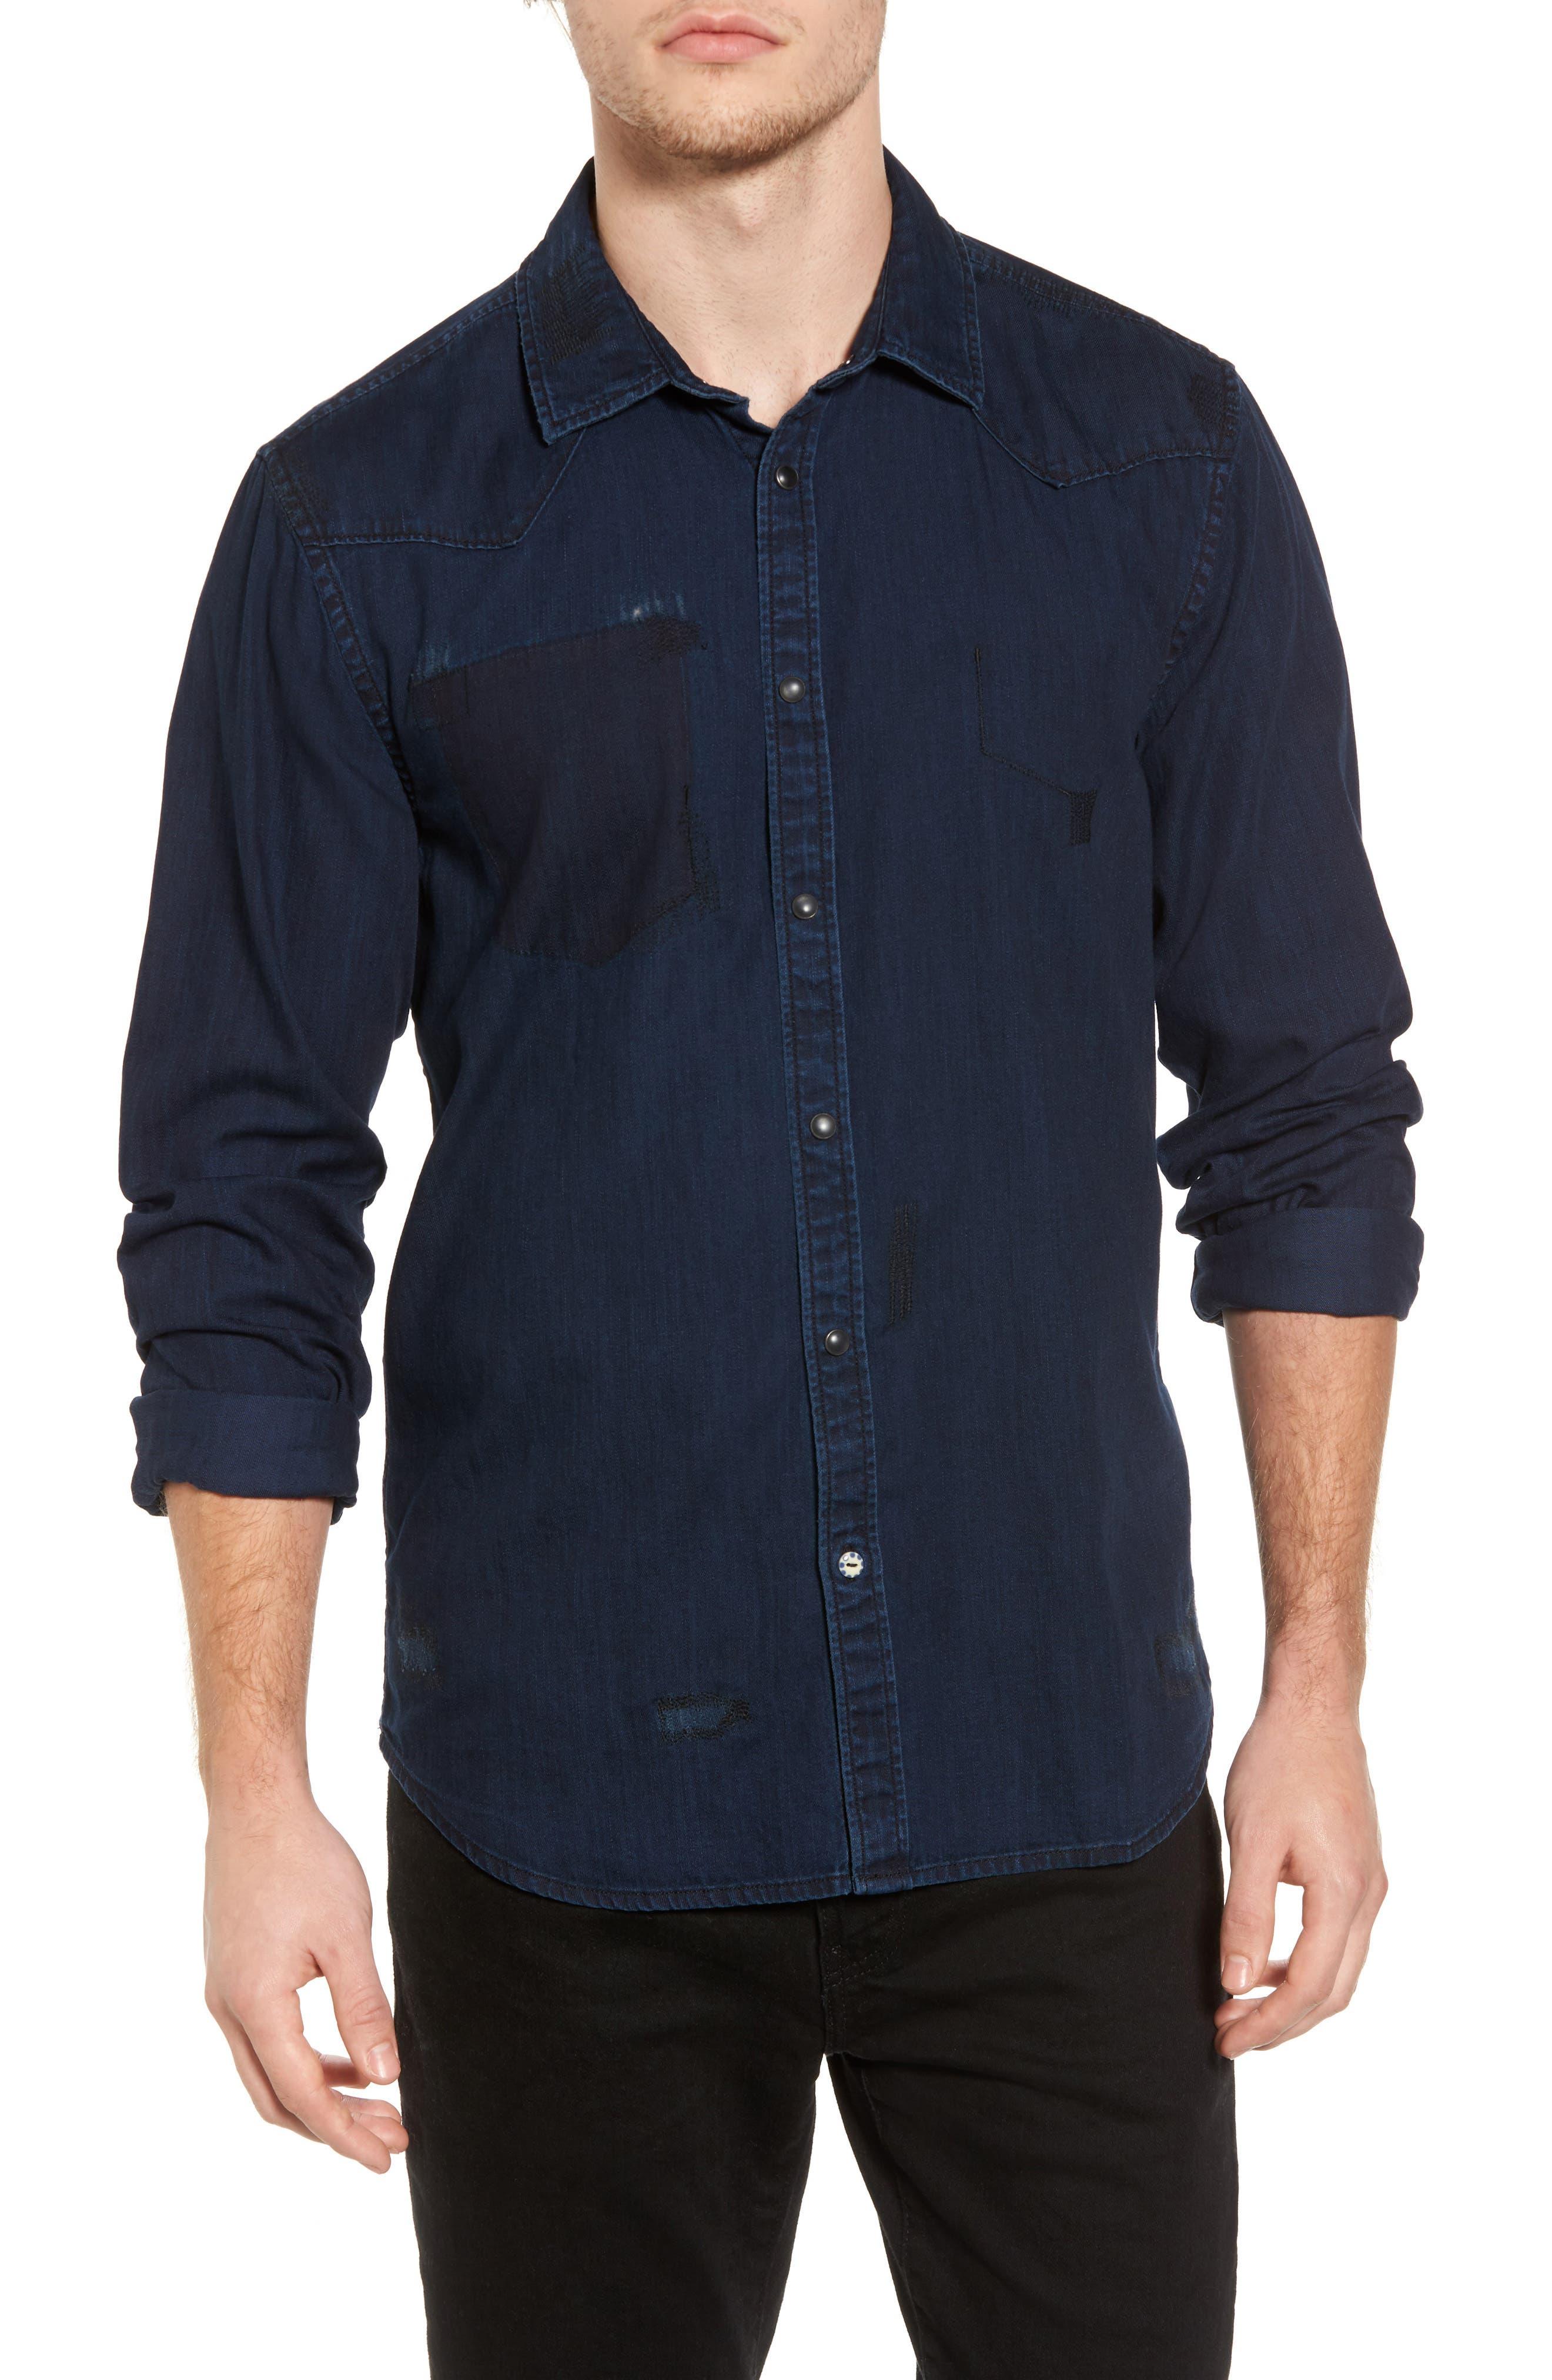 Pocketless Western Denim Shirt,                         Main,                         color,